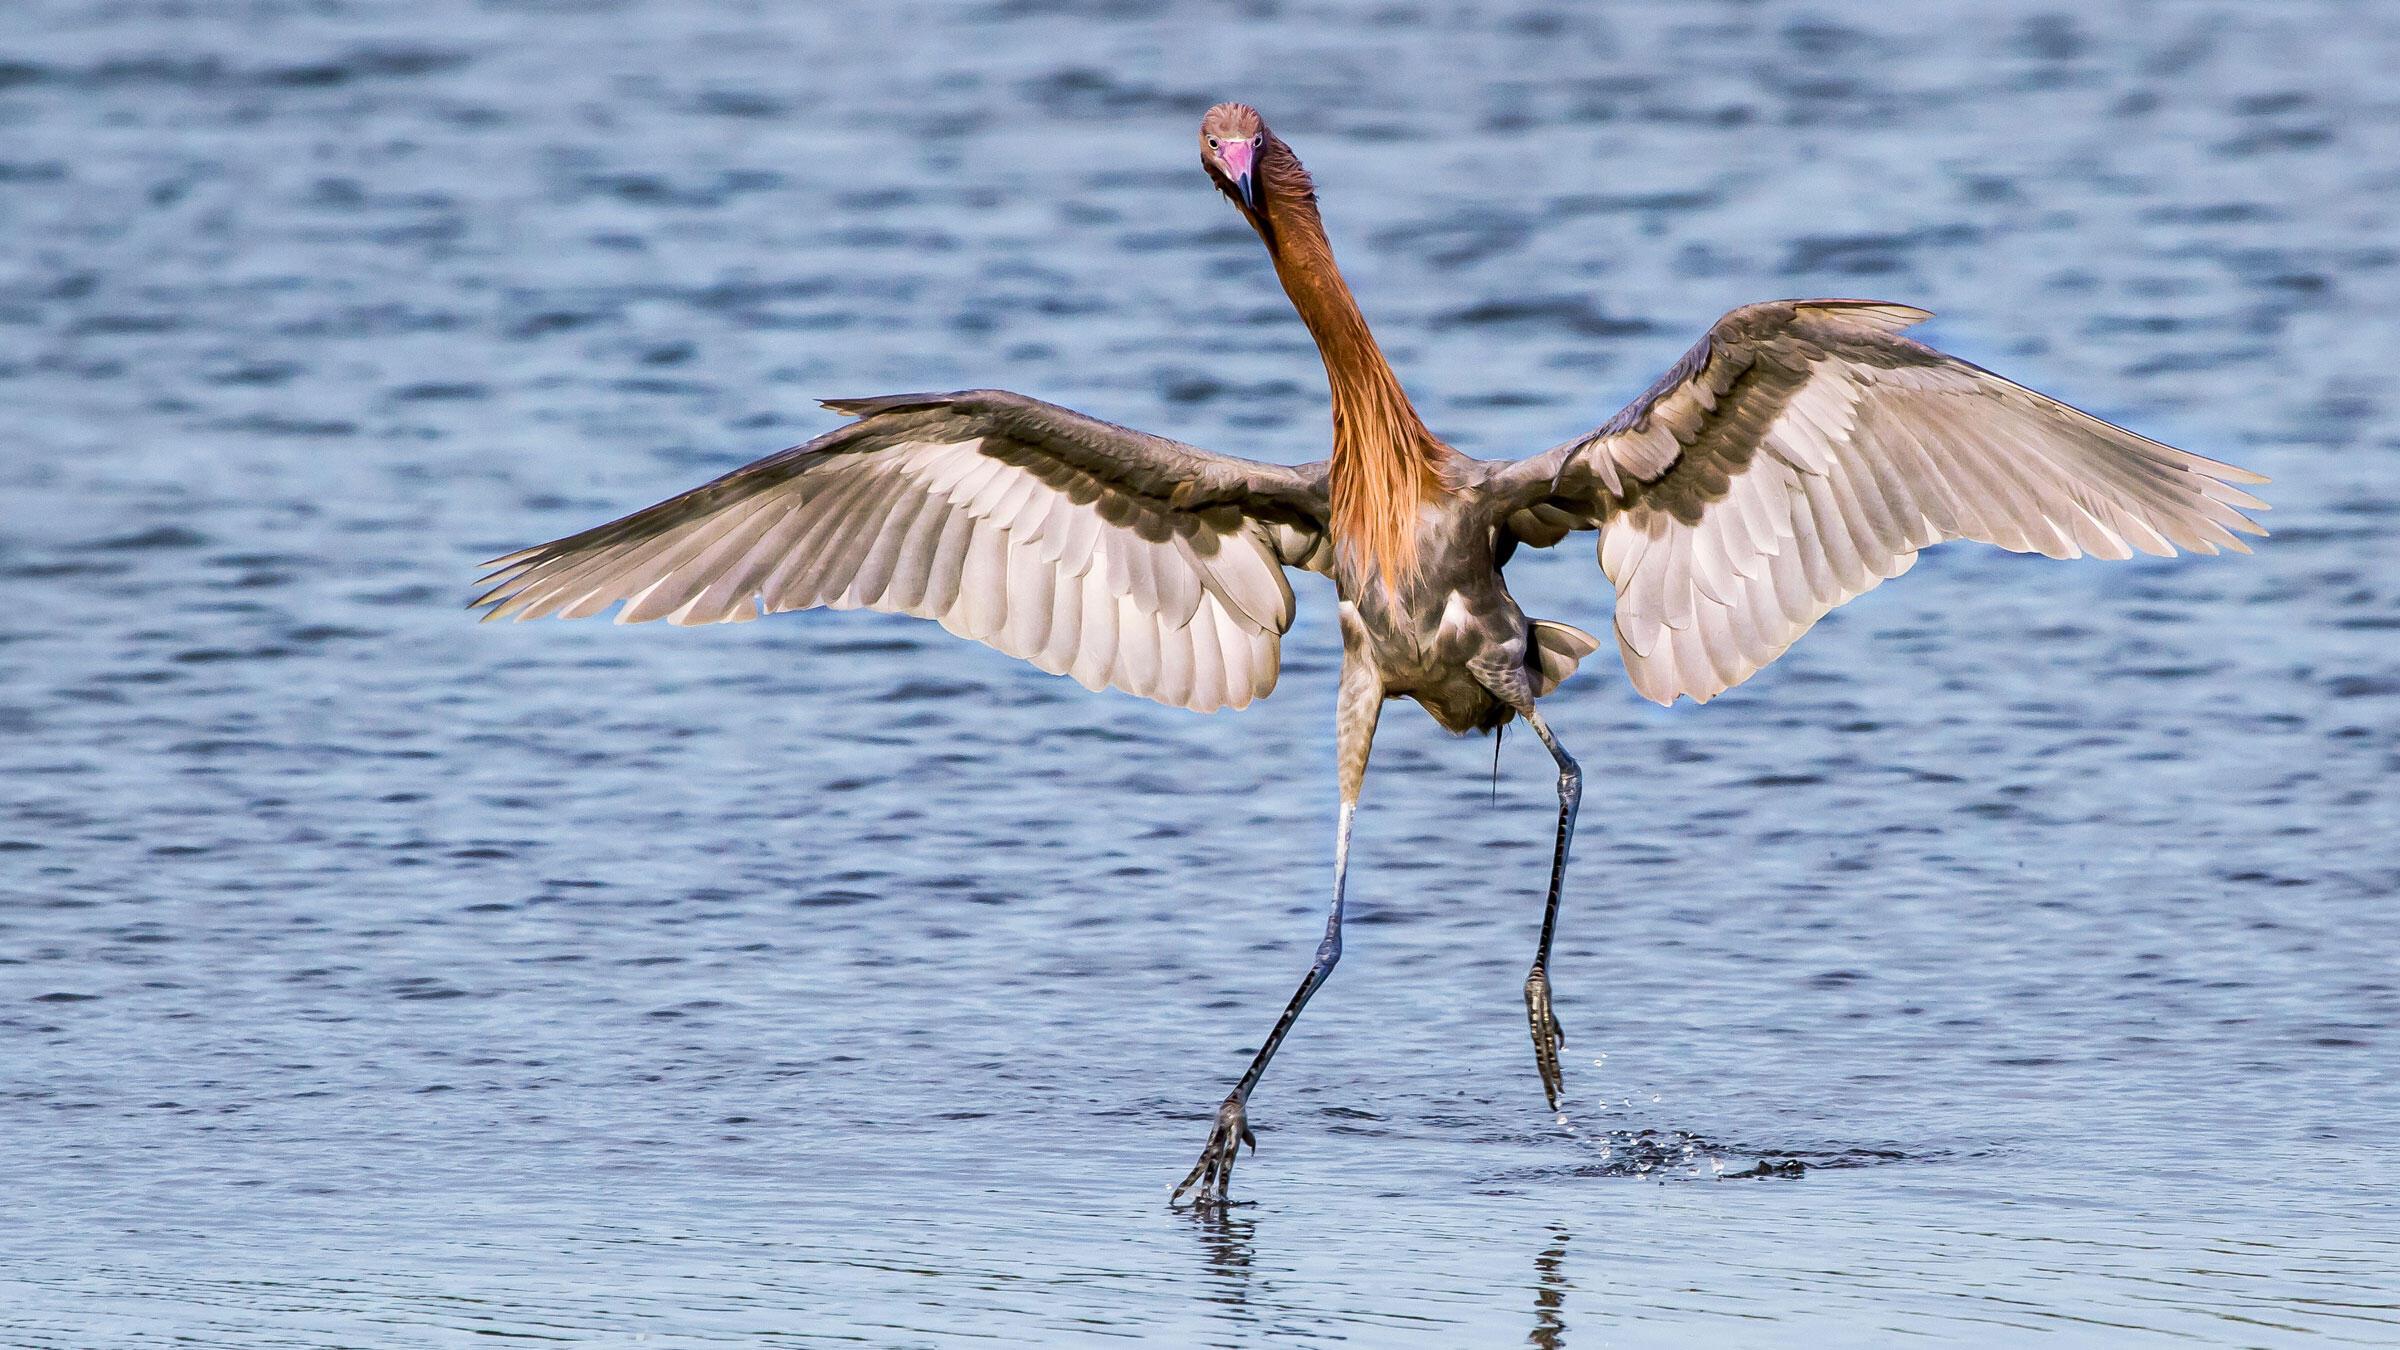 Reddish Egret. Andy Morffew/Flickr Creative Commons